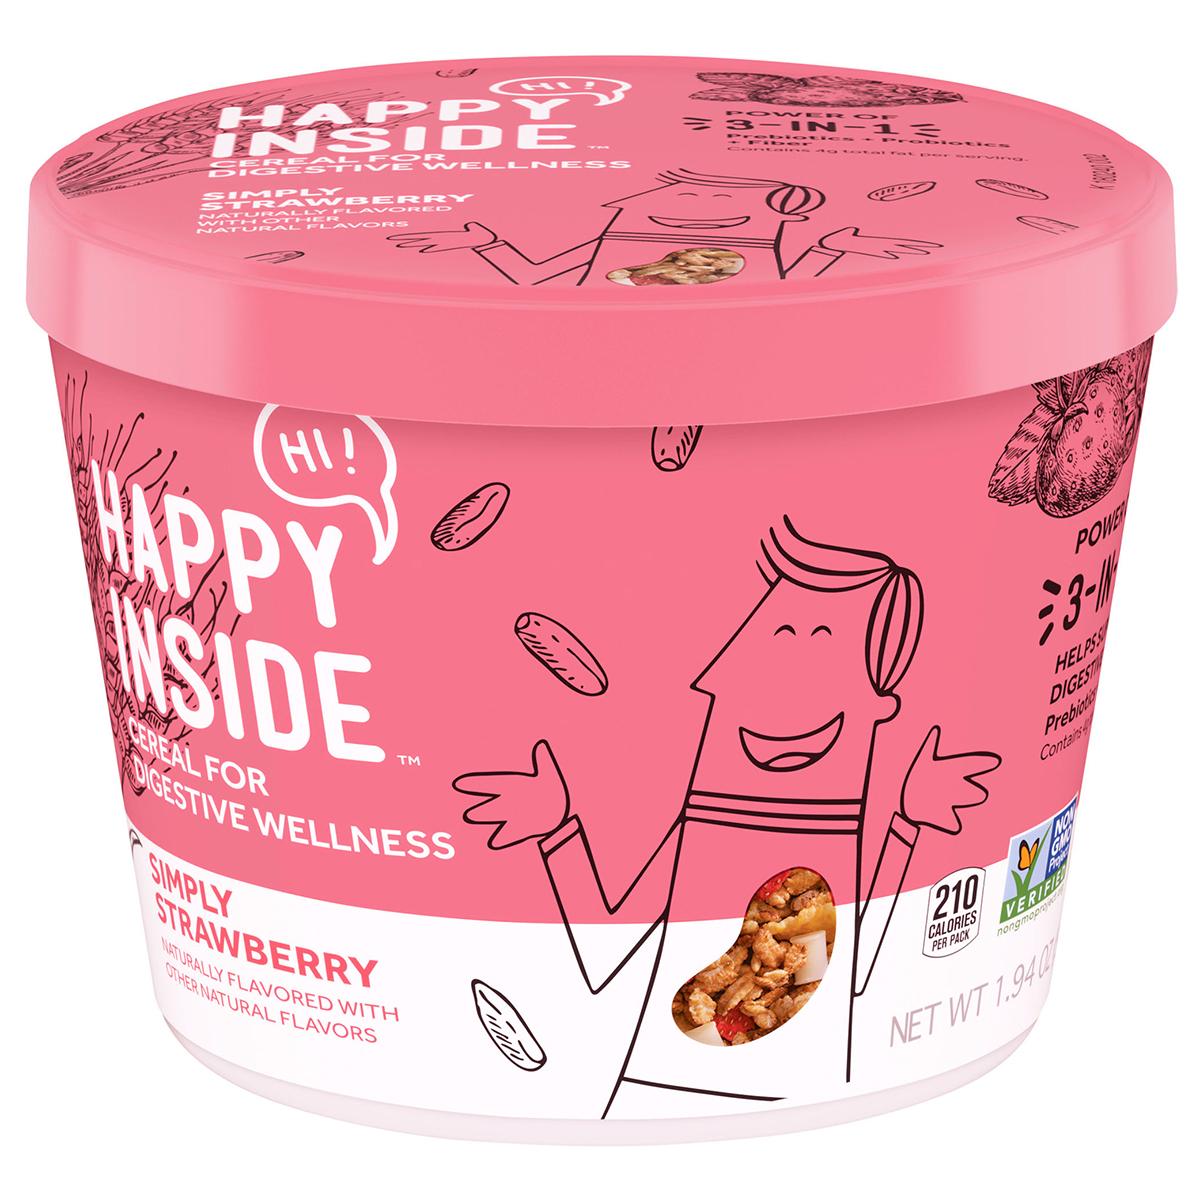 kellogg's hi! happy inside cereal